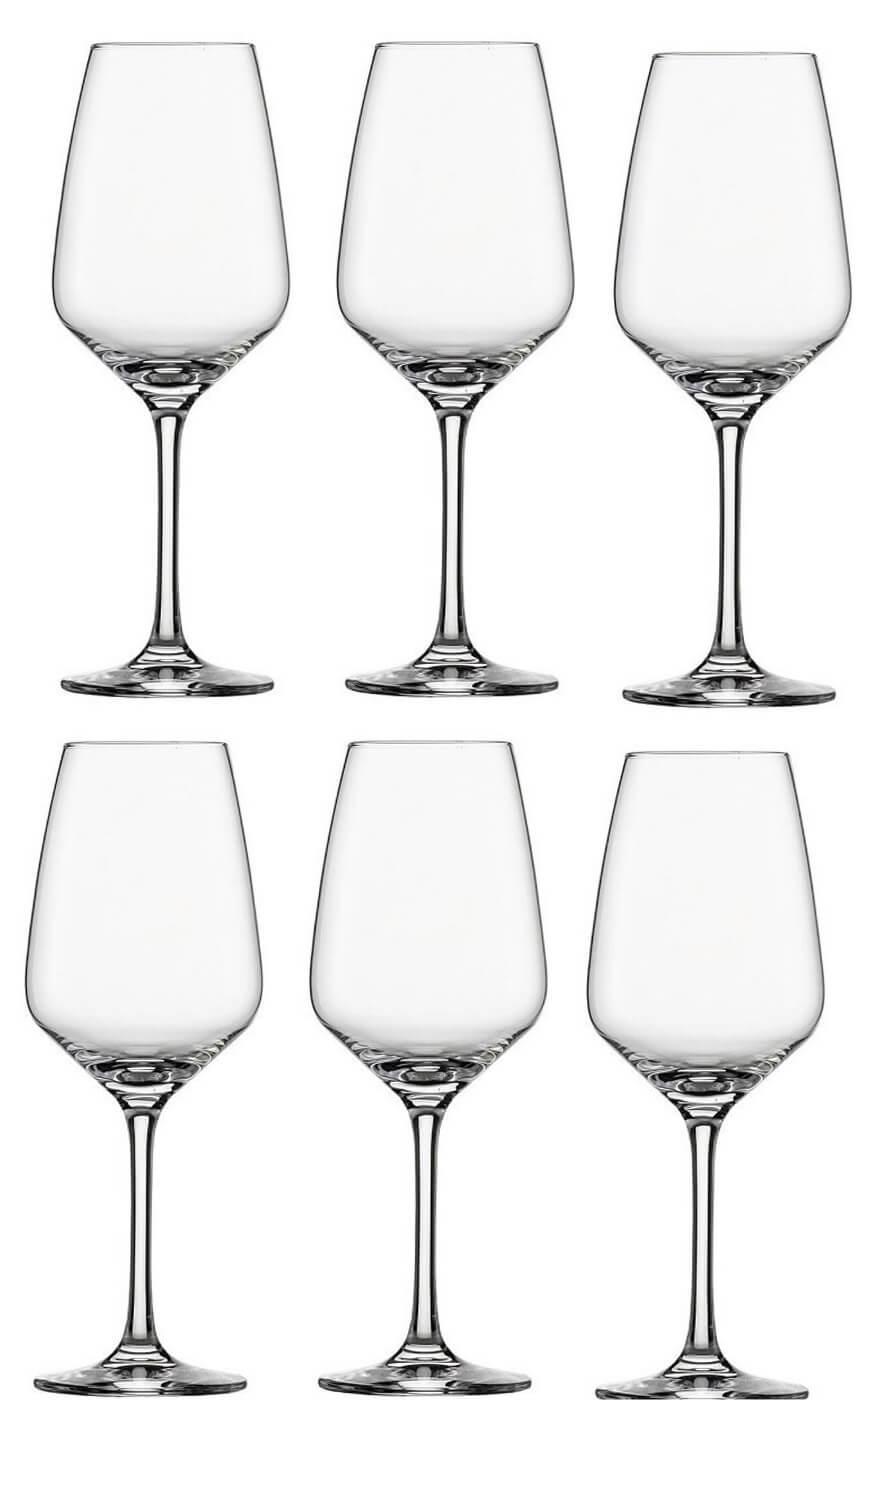 Онлайн каталог PROMENU: Набор бокалов для белого вина Schott Zwiesel Taste, объем 0,356 л, 6 шт.                                   115670_6шт